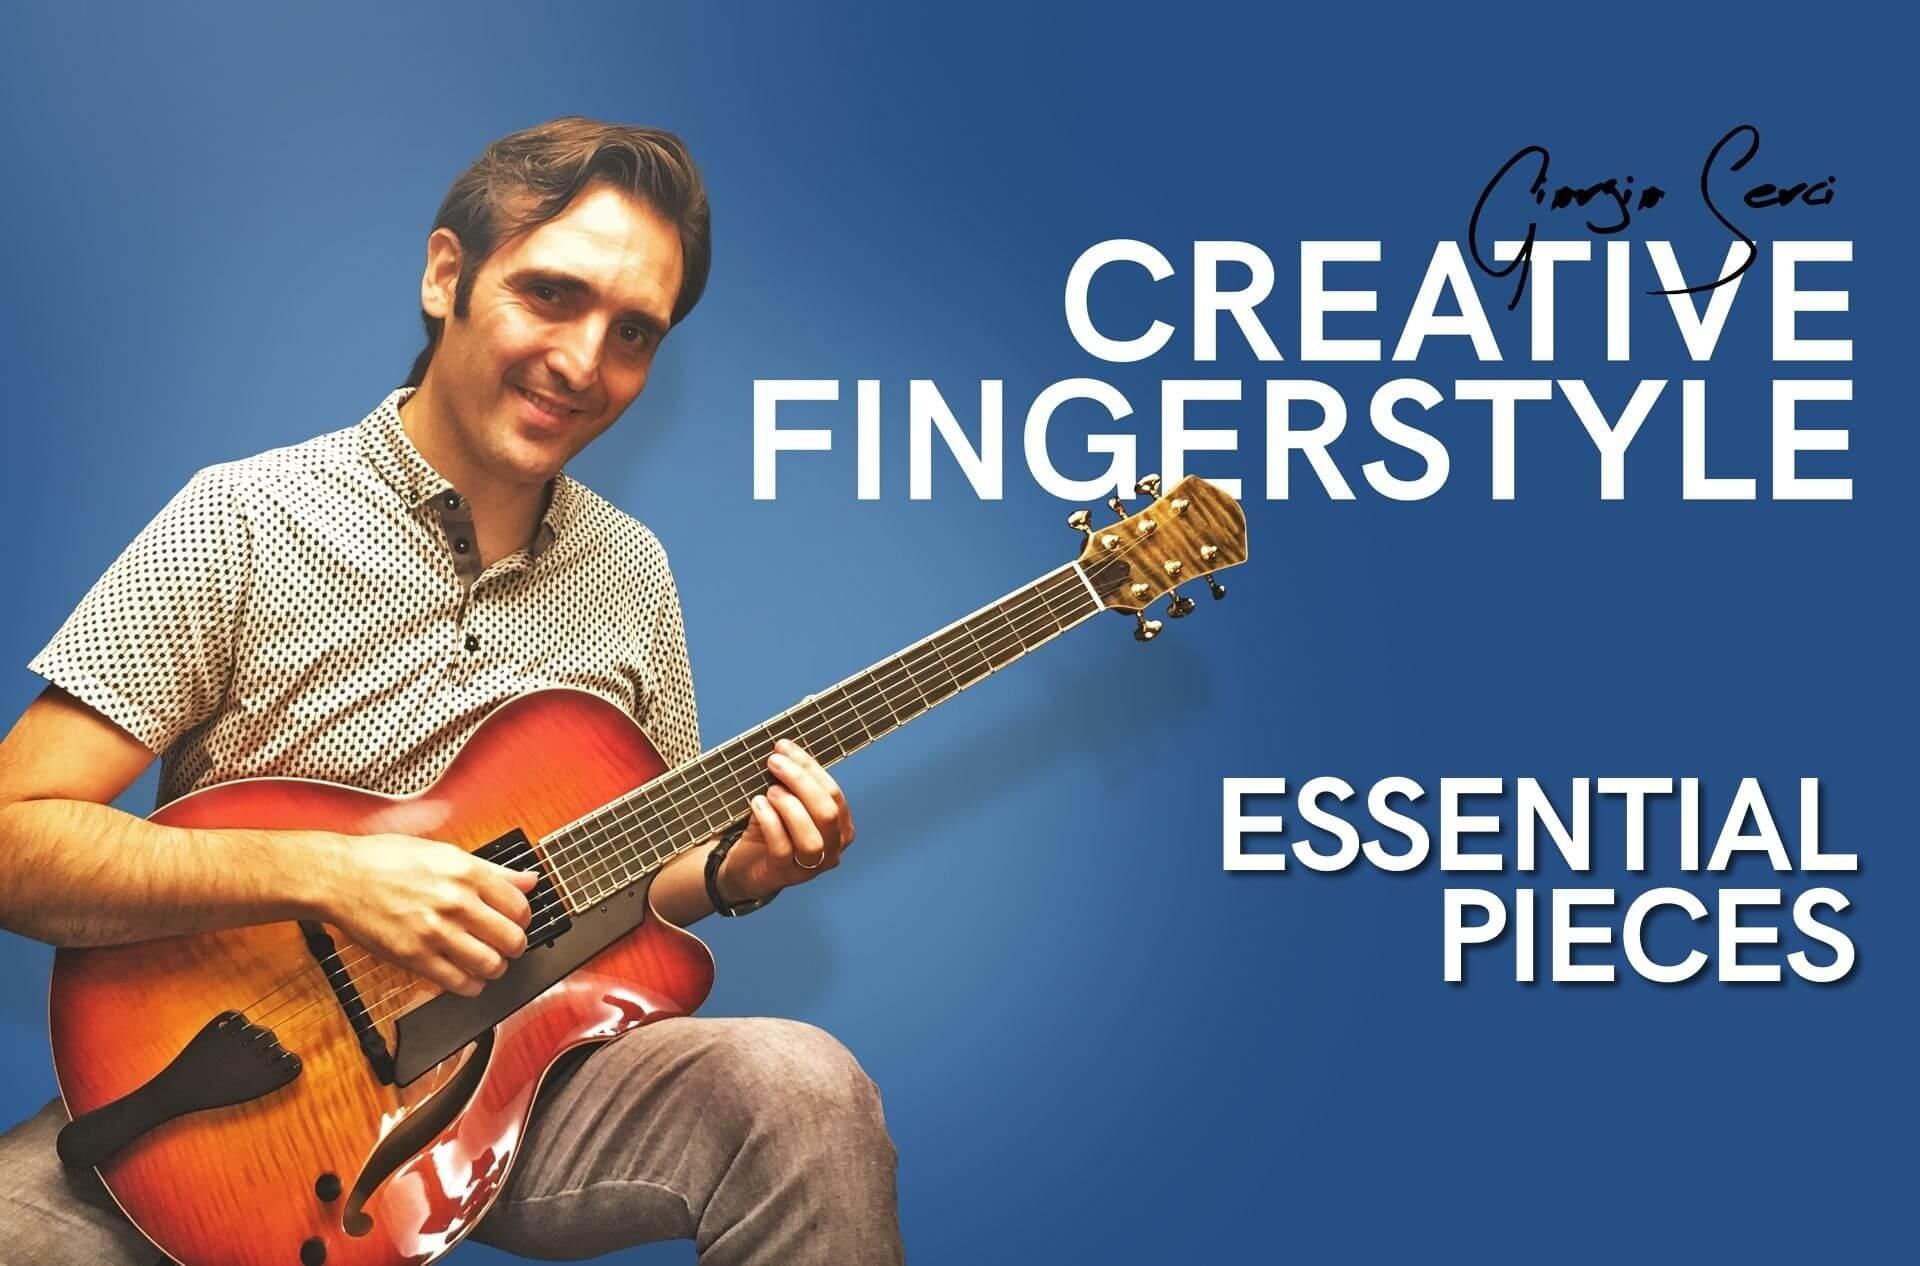 Georgio Serci - Creative Fingerstyle Essential Pieces